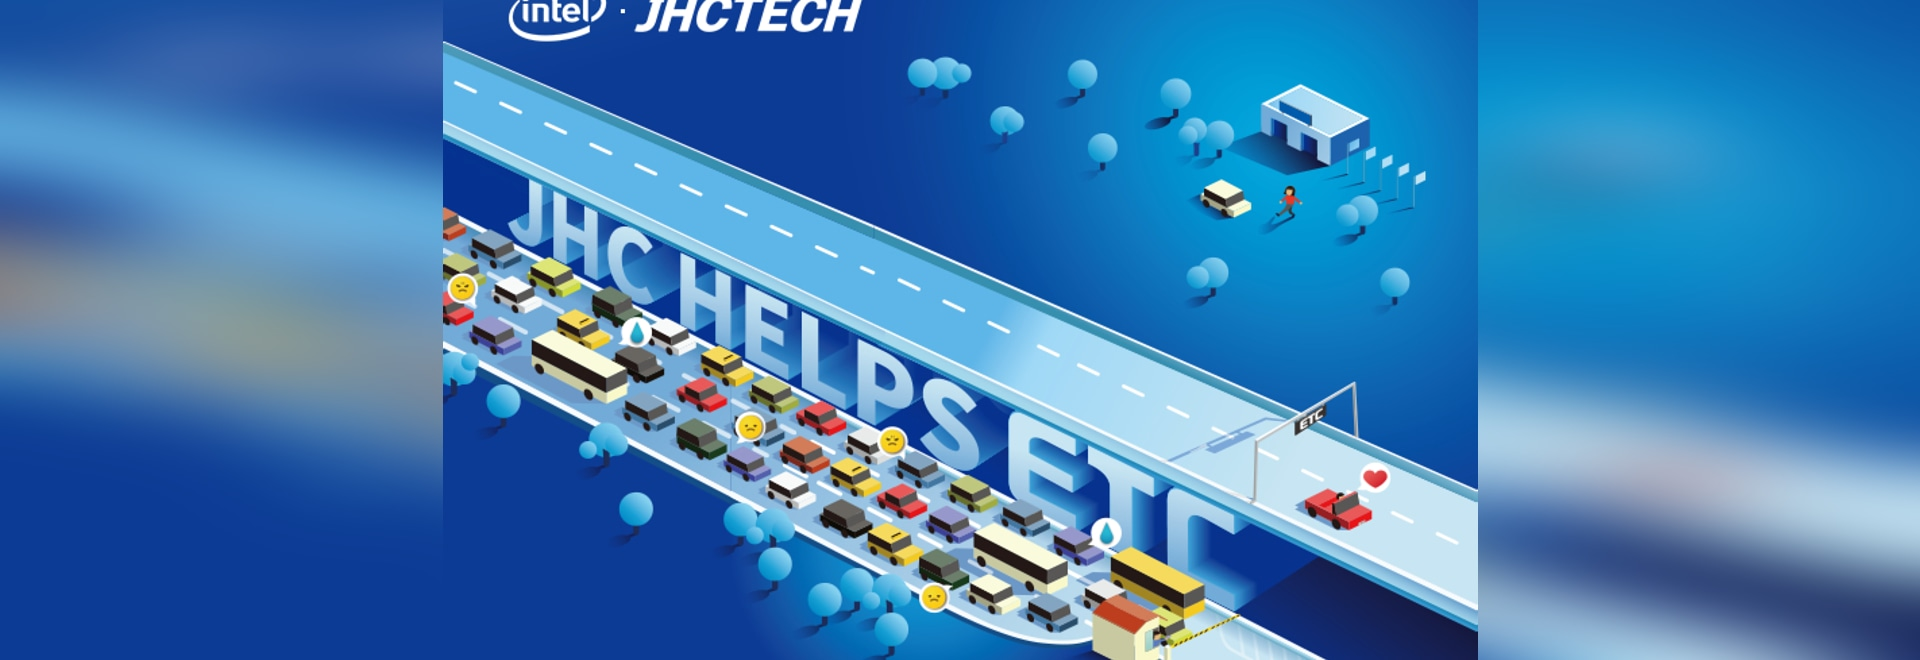 Industrial PC Design for ETC System